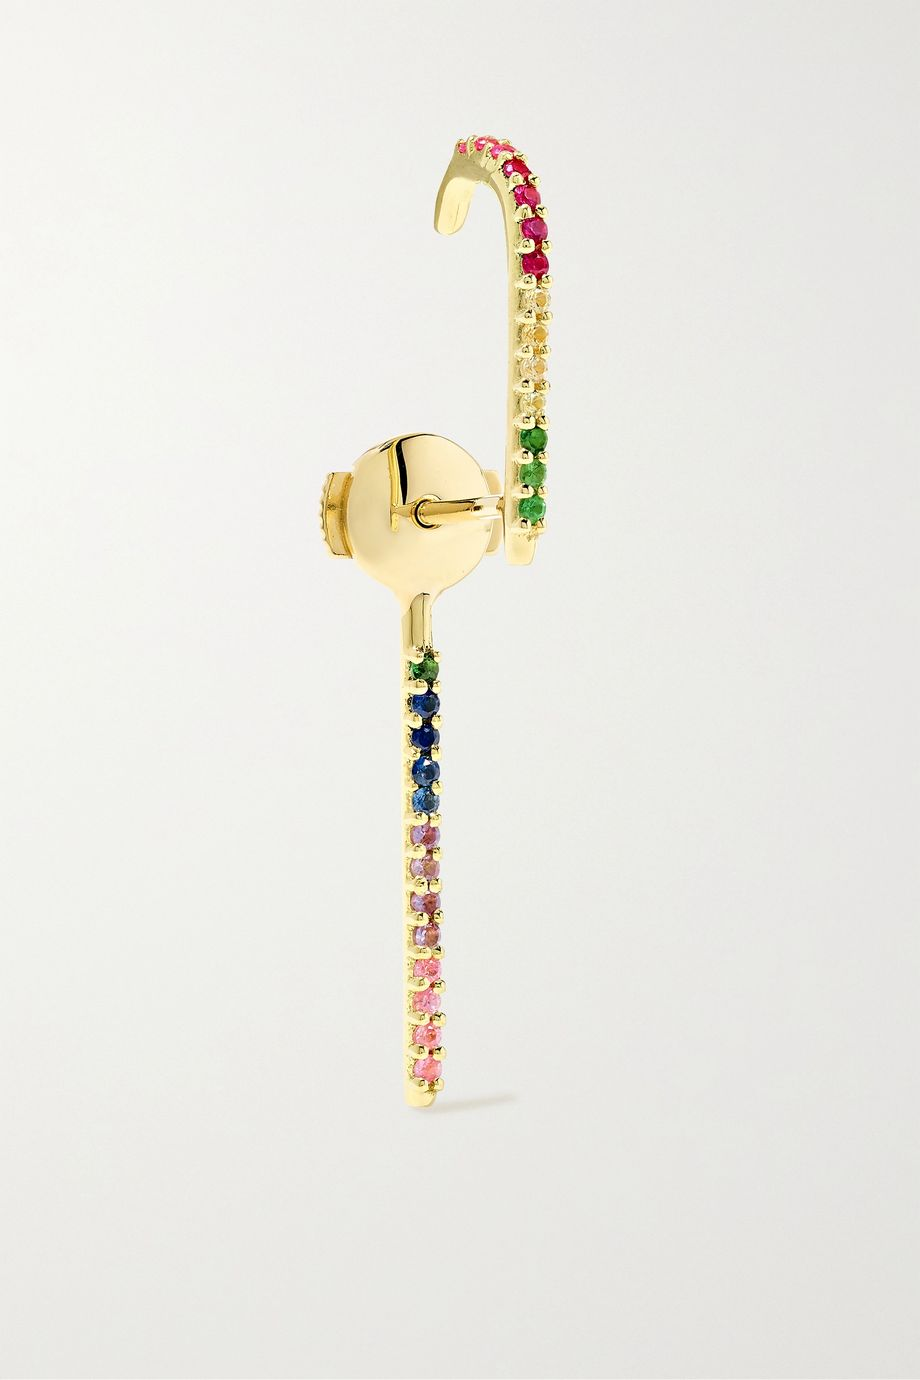 KATKIM Petite Francesca gold sapphire earring